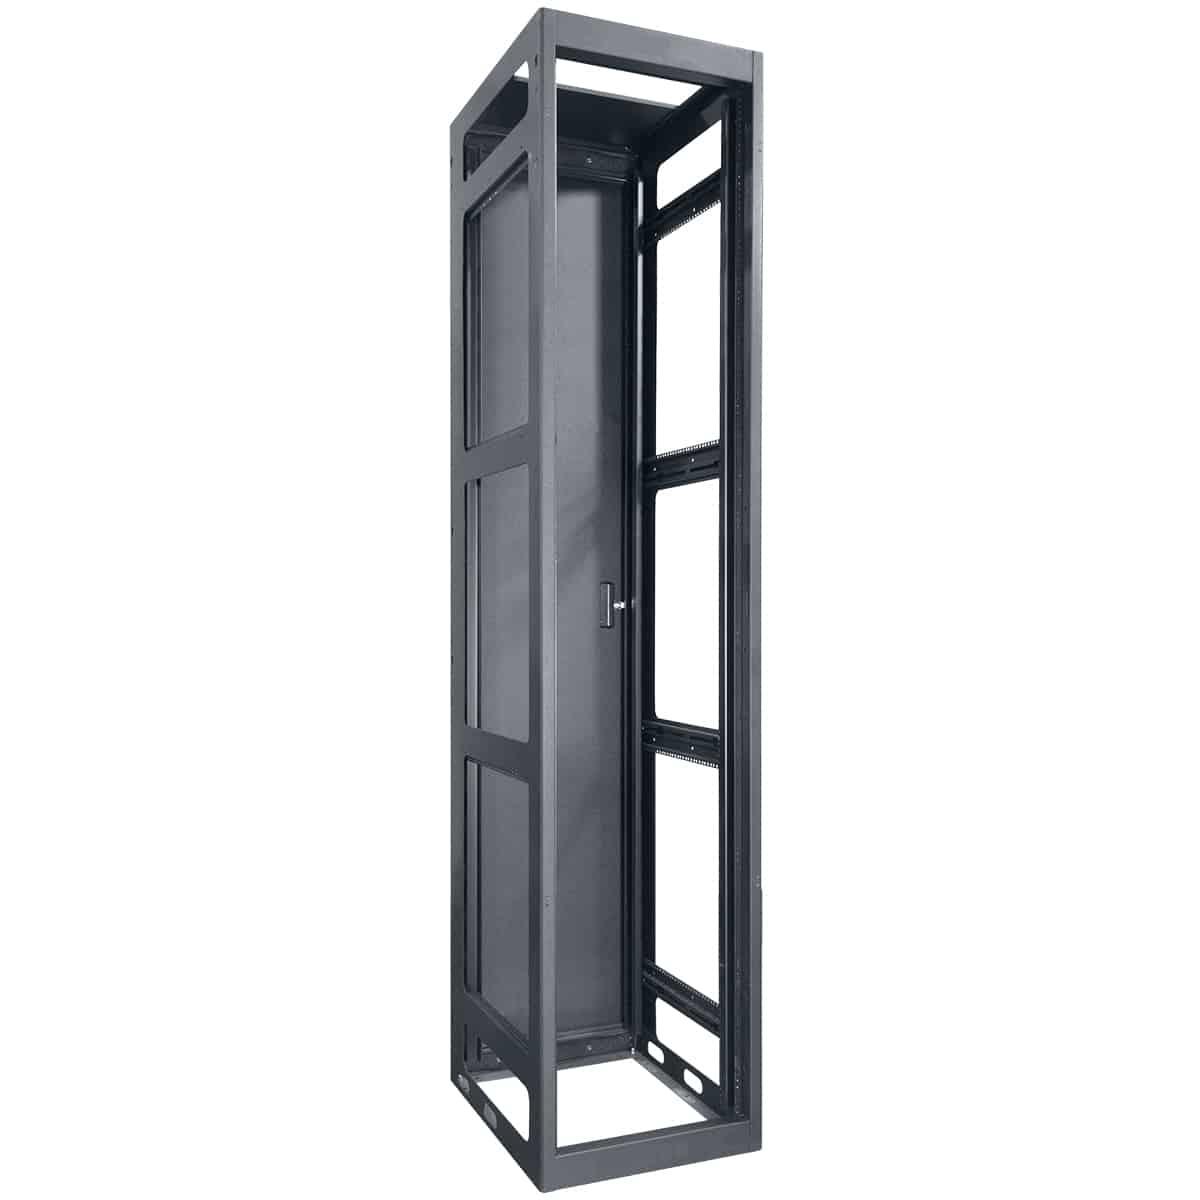 "LGTR Tall Open Frame Rack, 54U x 22""W"